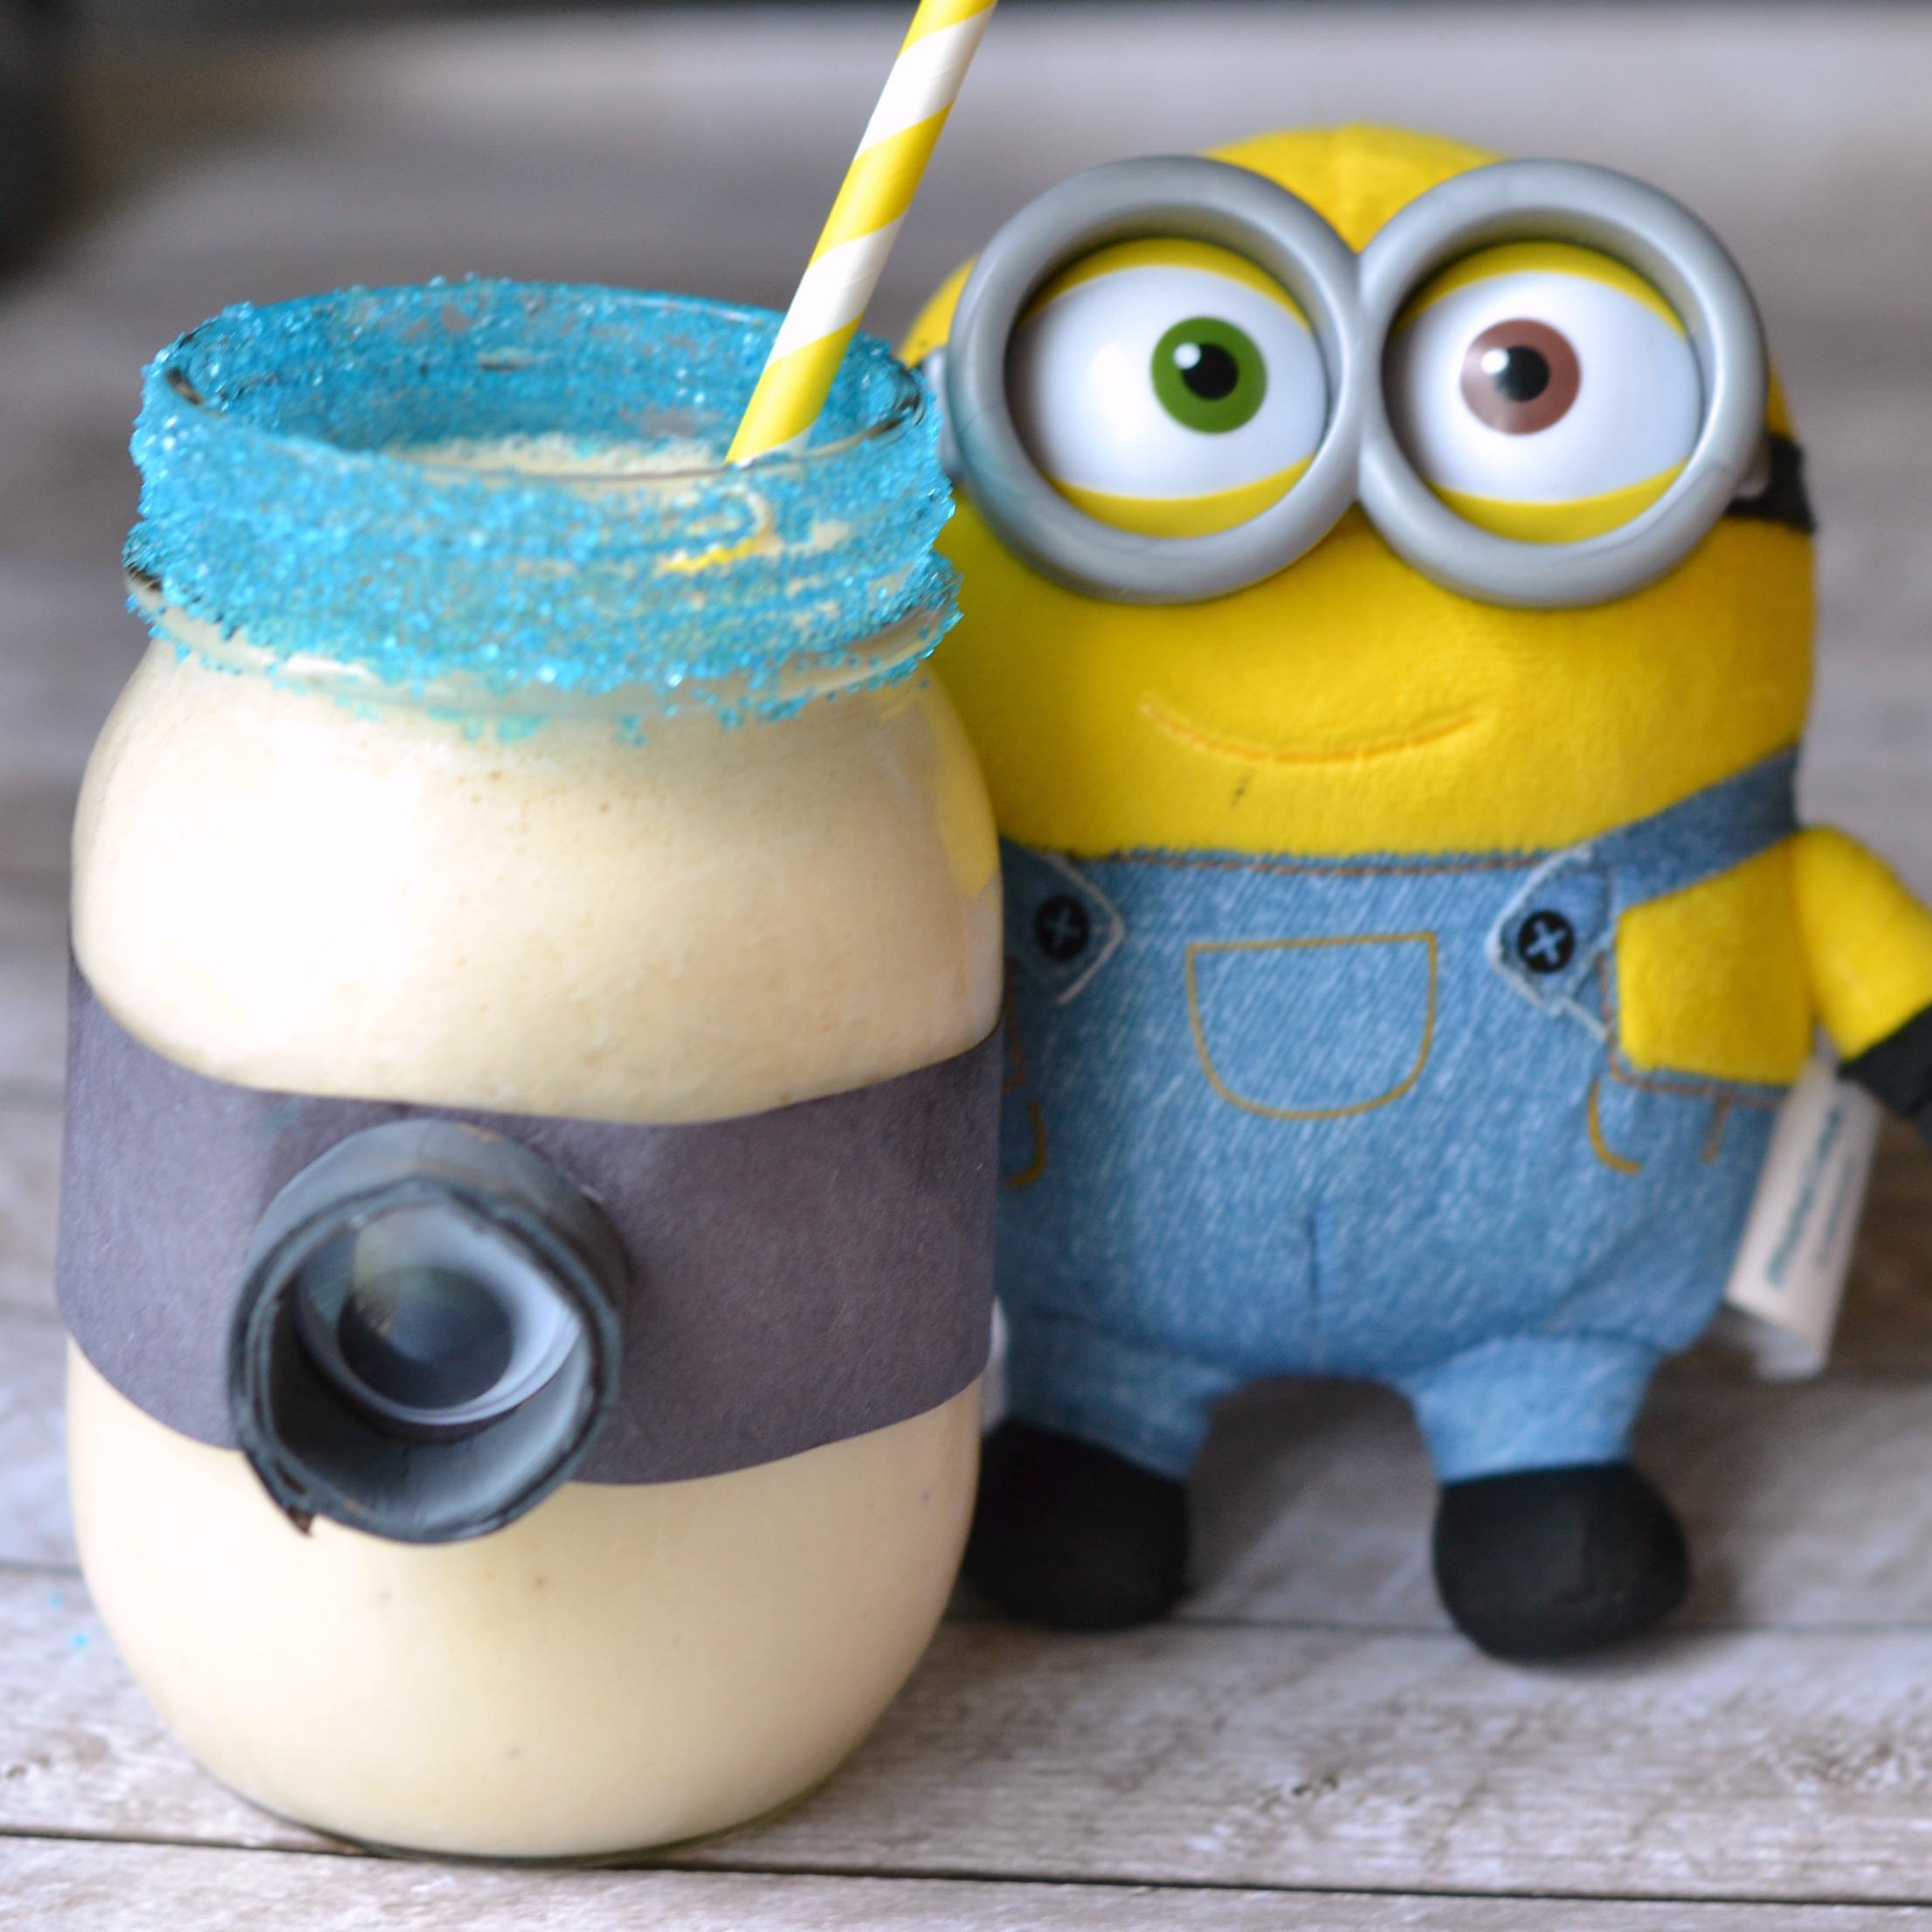 Minion Smoothie (a.k.a. Banana Peanut Butter Smoothie)